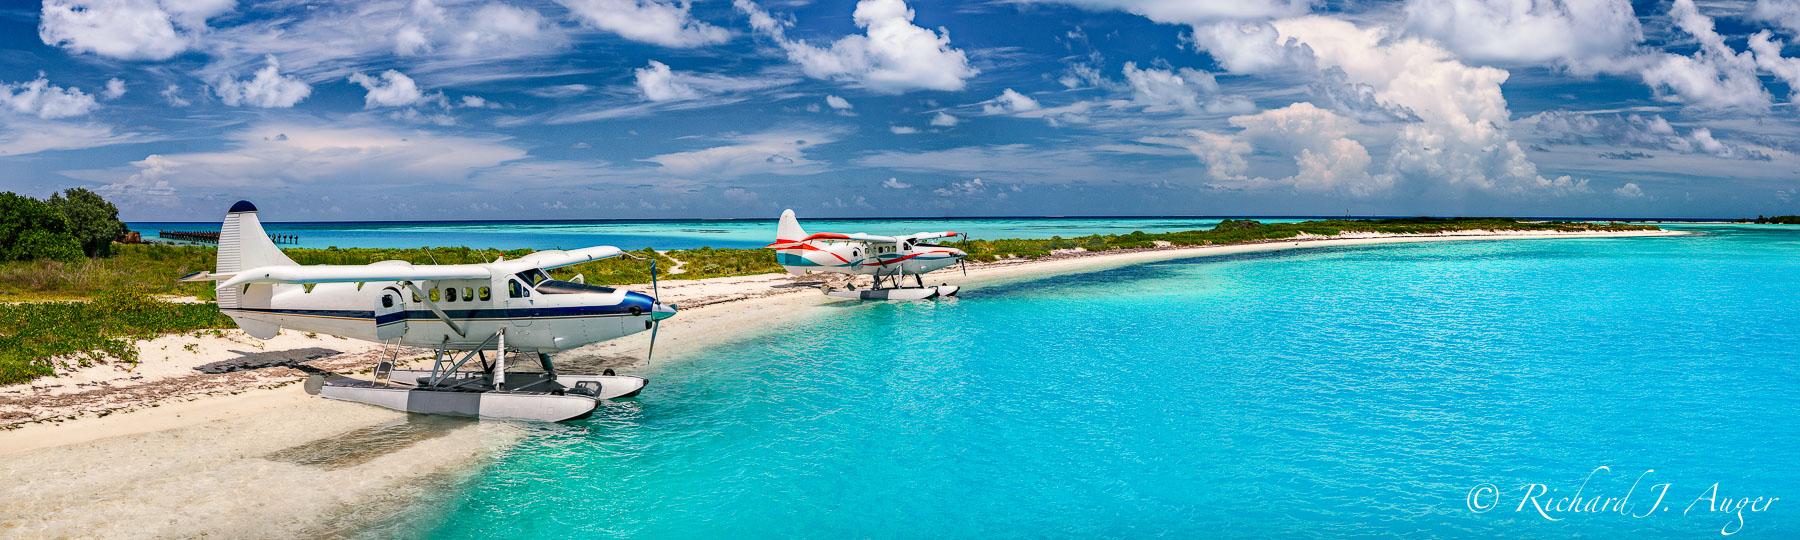 Dry Tortugas National Park, Sea Planes, Island, Ocean, Blue, Getaway, Tropical, Panorama, Photograph, Photographer, Seascape